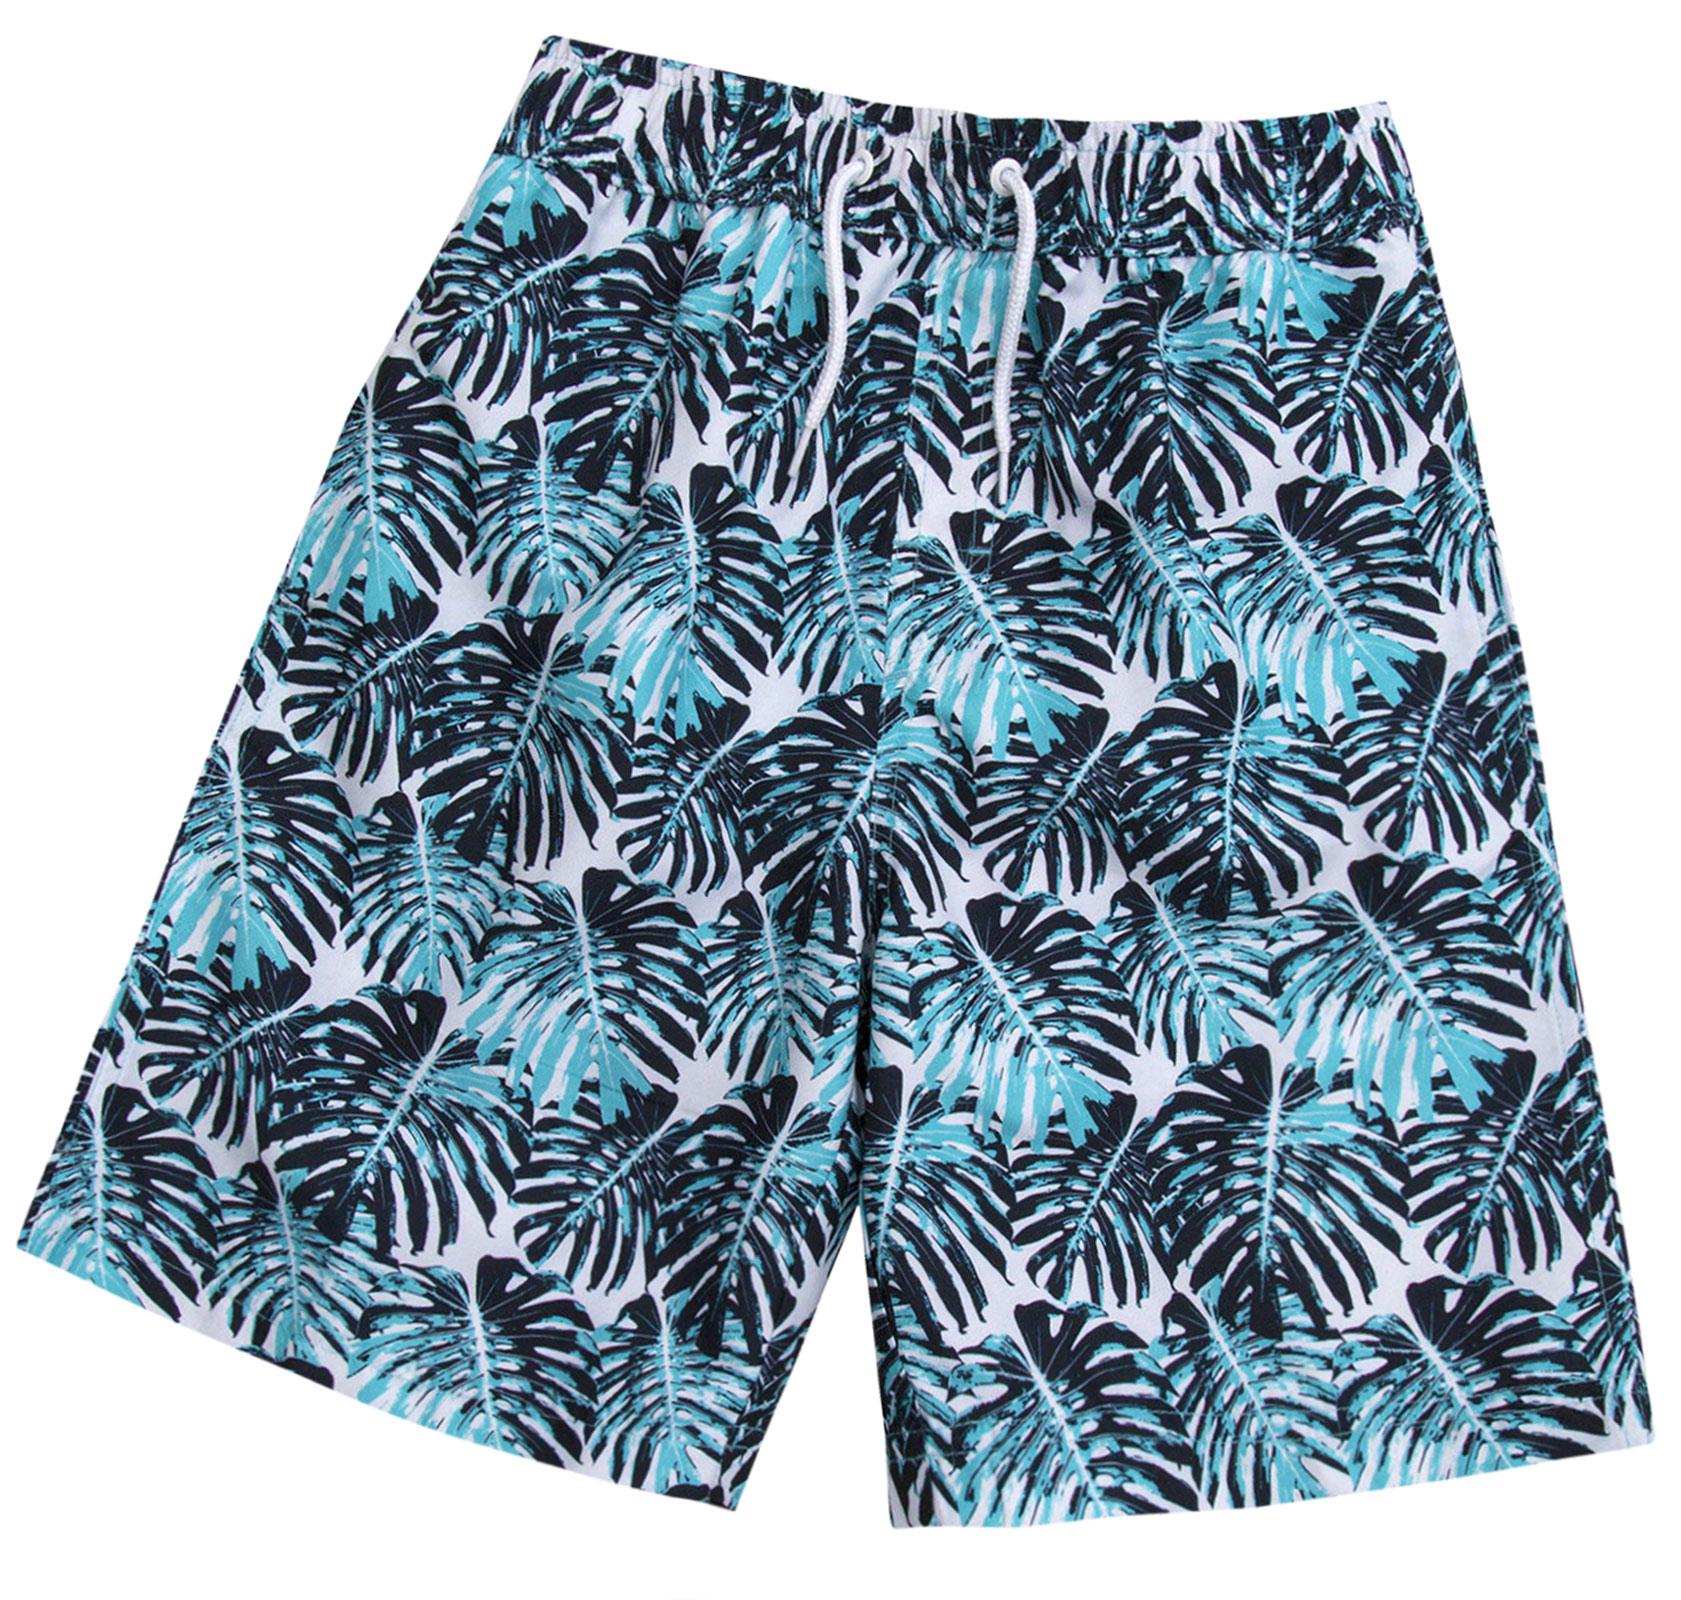 Boys-Swimming-Shorts-Kids-Bermuda-Holiday-Trunks-2-3-4-5-6-7-8-9-10-11-12-13-Yrs thumbnail 5